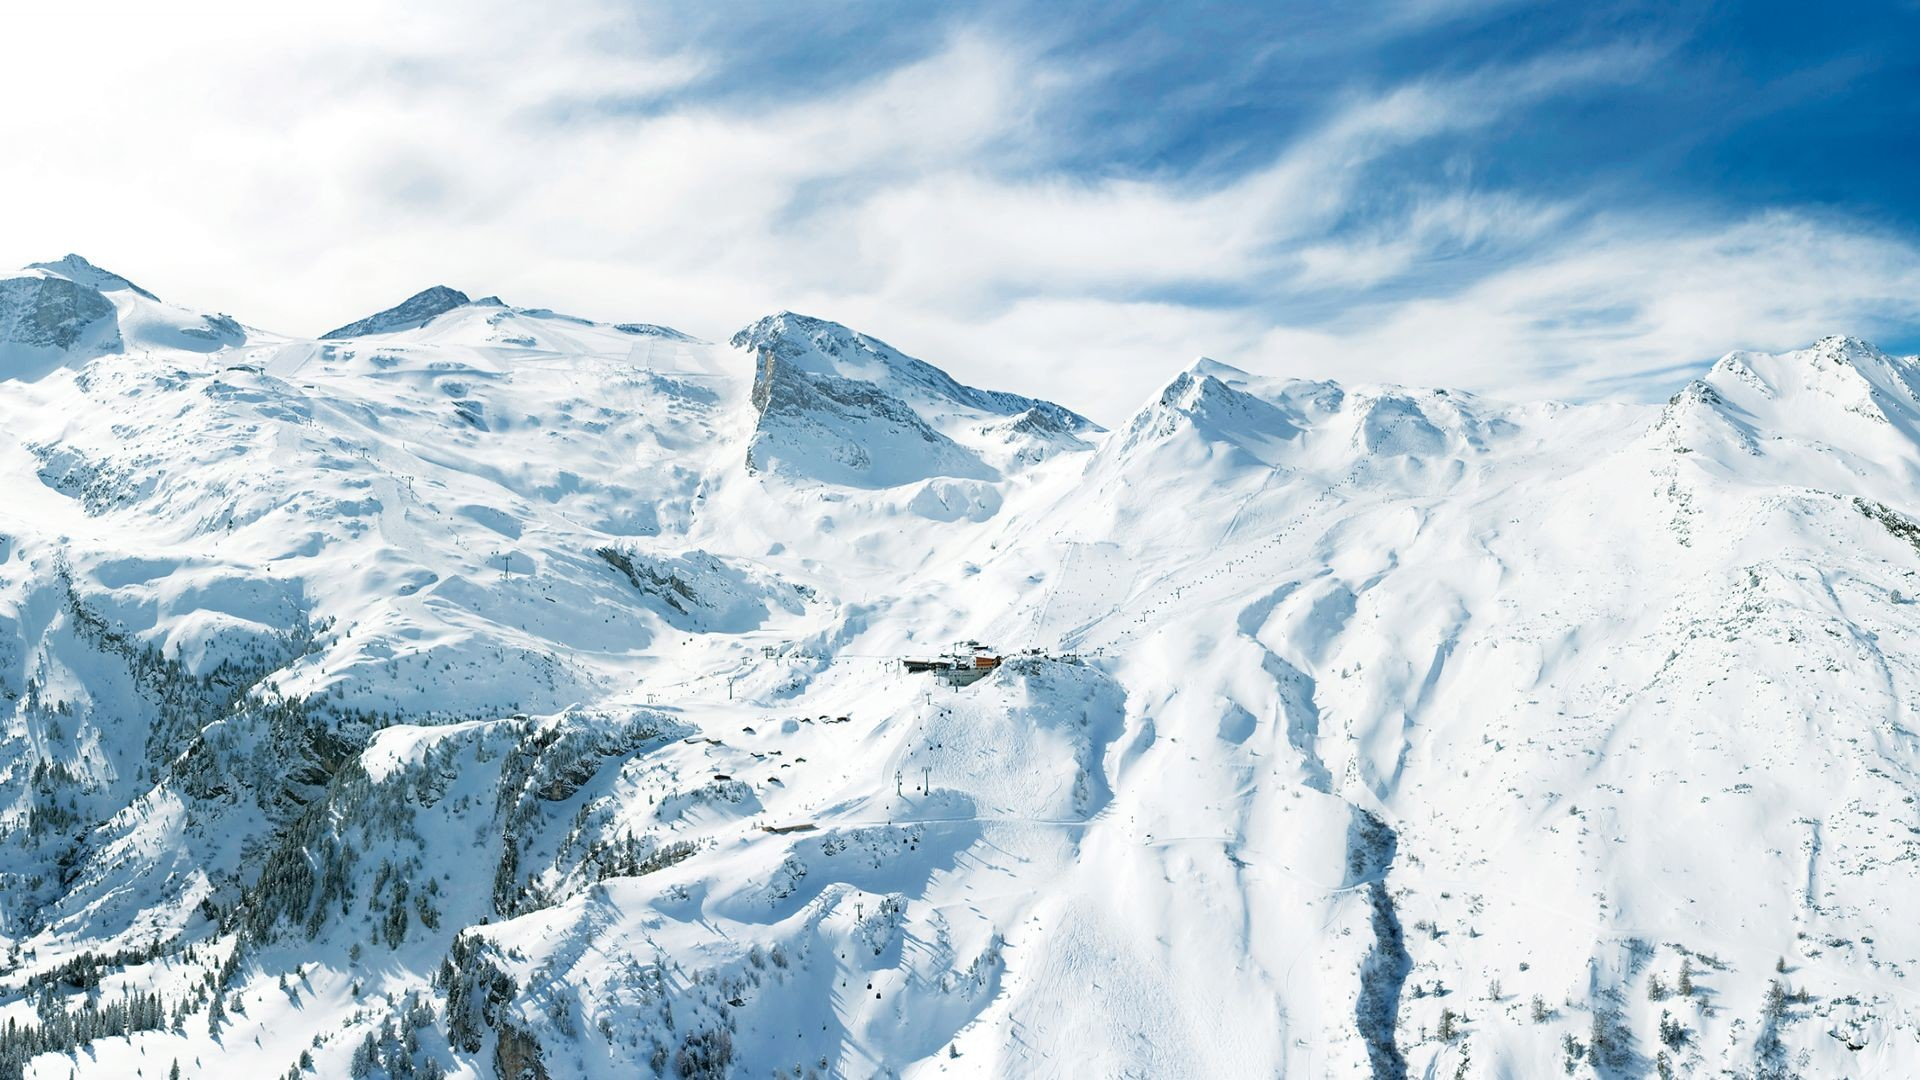 Winter Mountain Wallpaper HD #5338